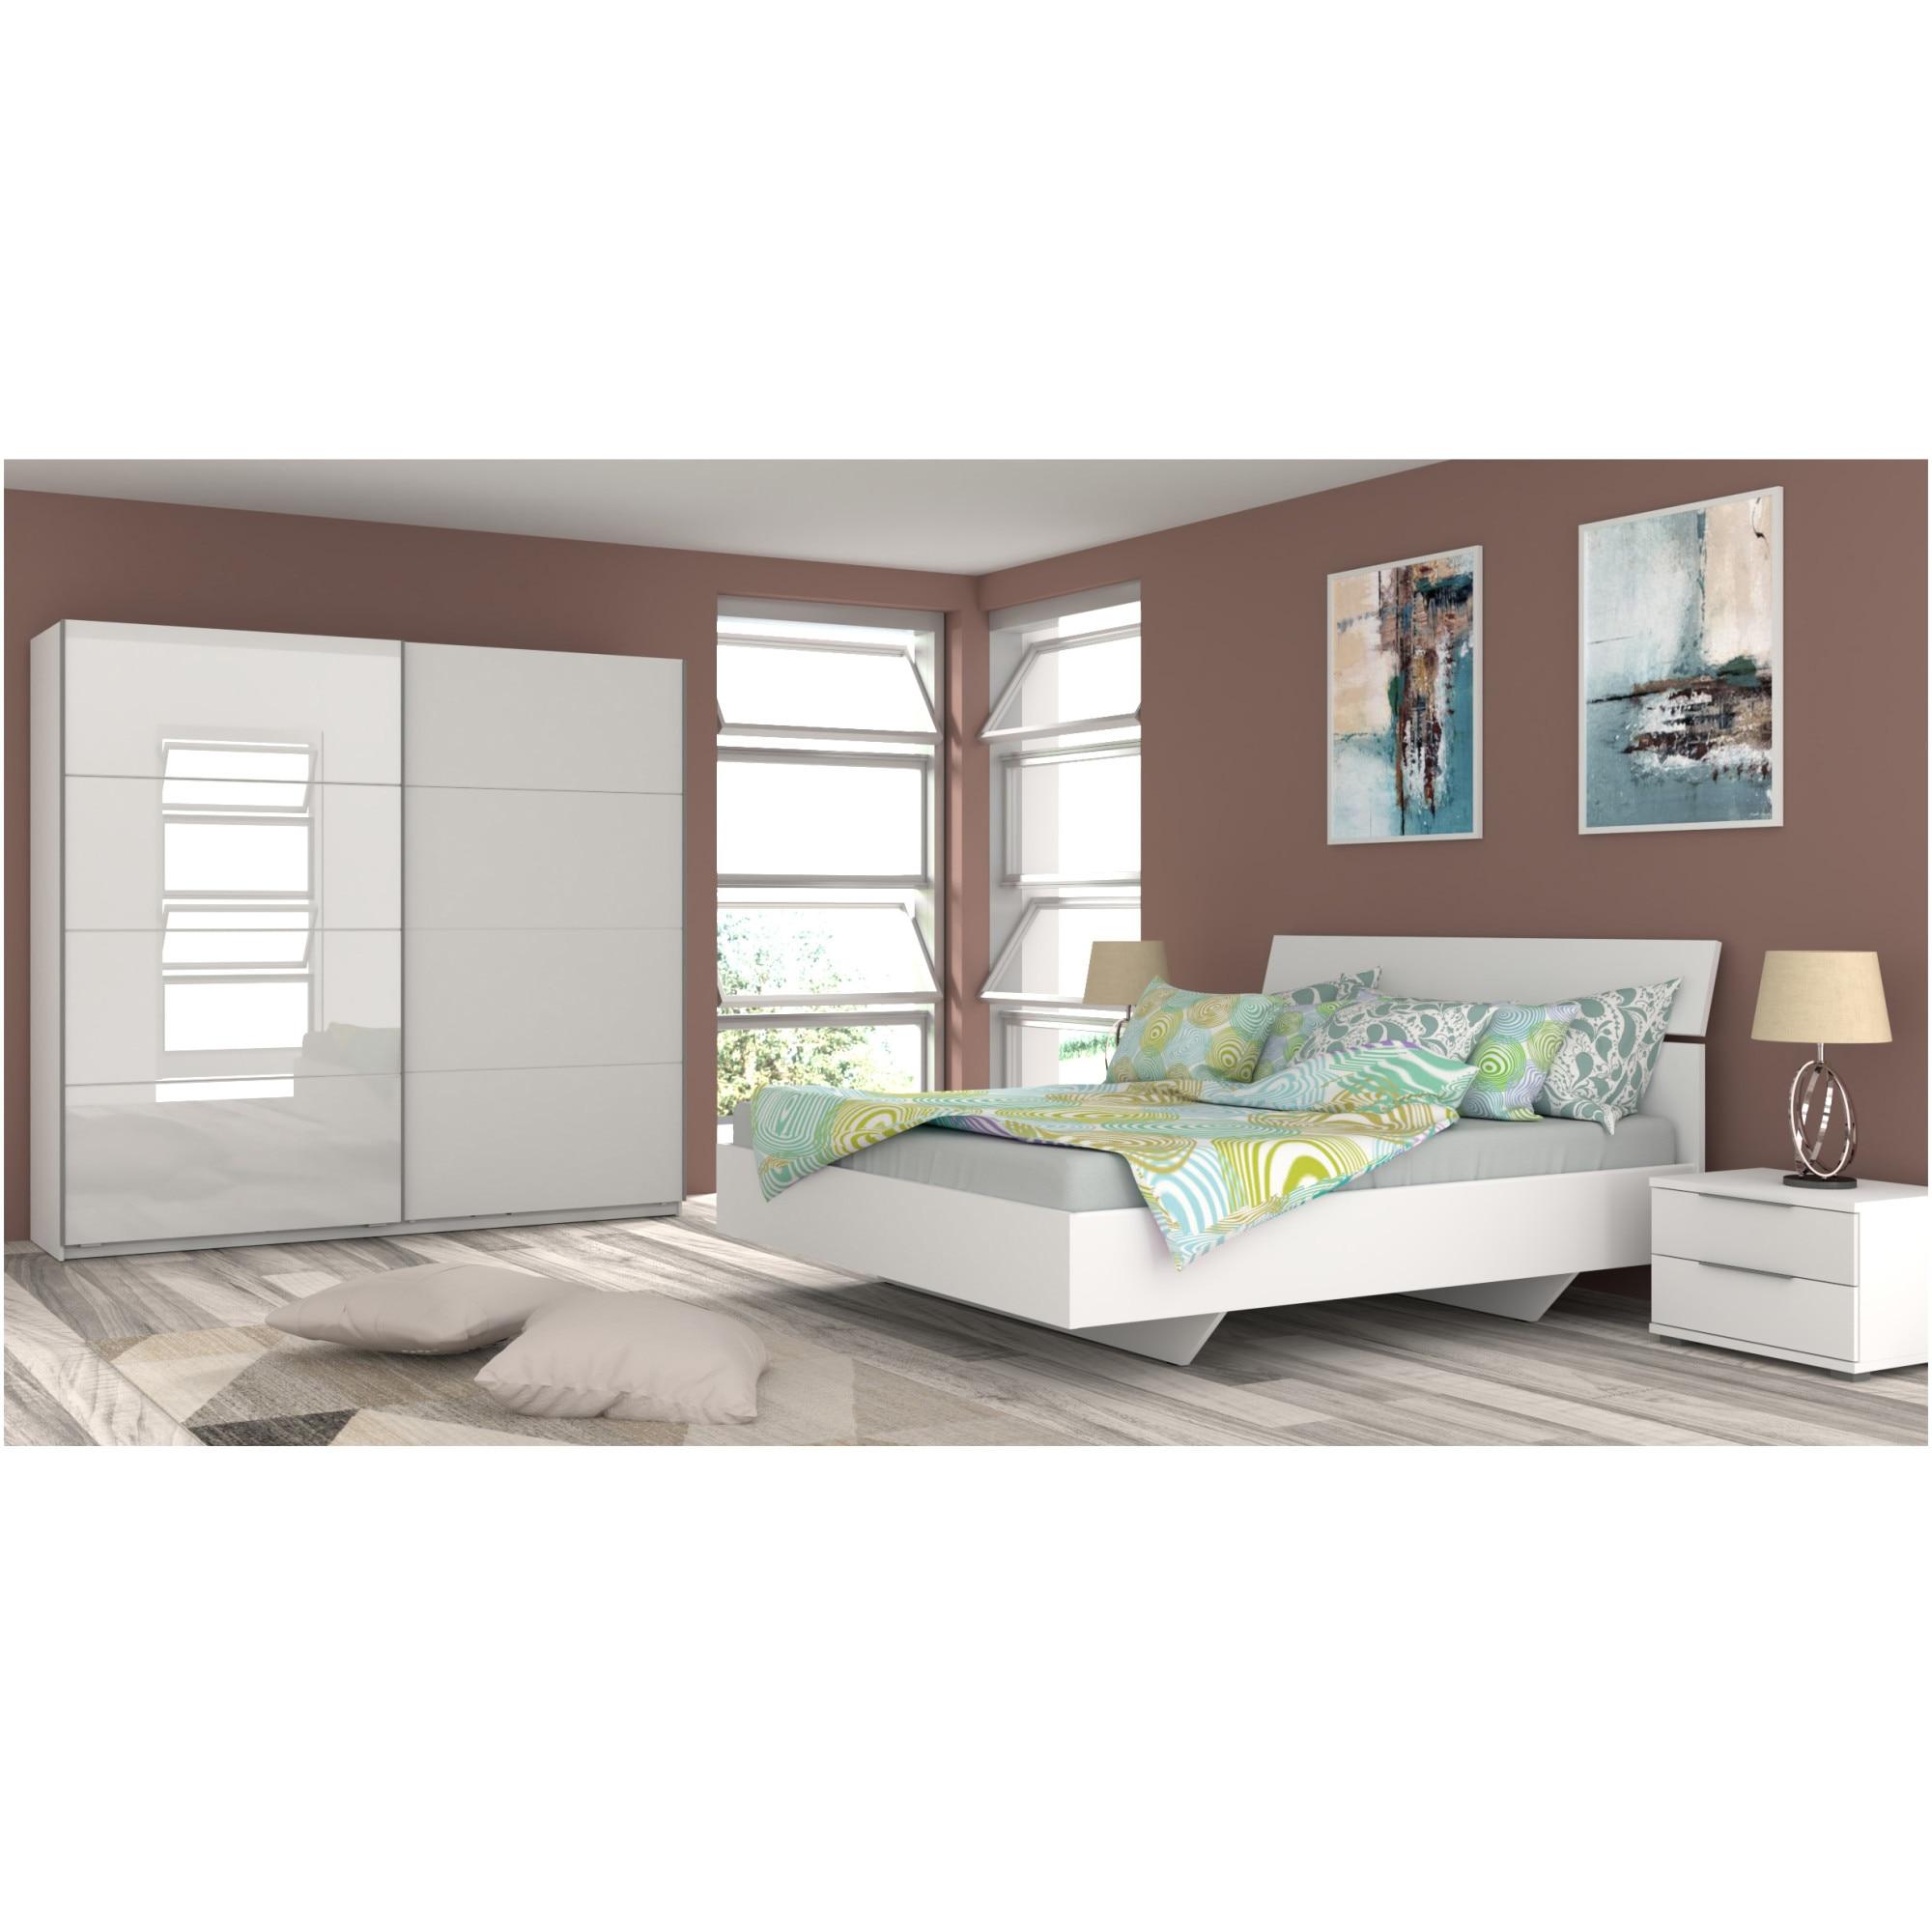 Fotografie Dormitor Kring Dallas, Pat 160x200 cm, Dulap usi glisante 215x60x210 cm, 2 Noptiere, Somiera